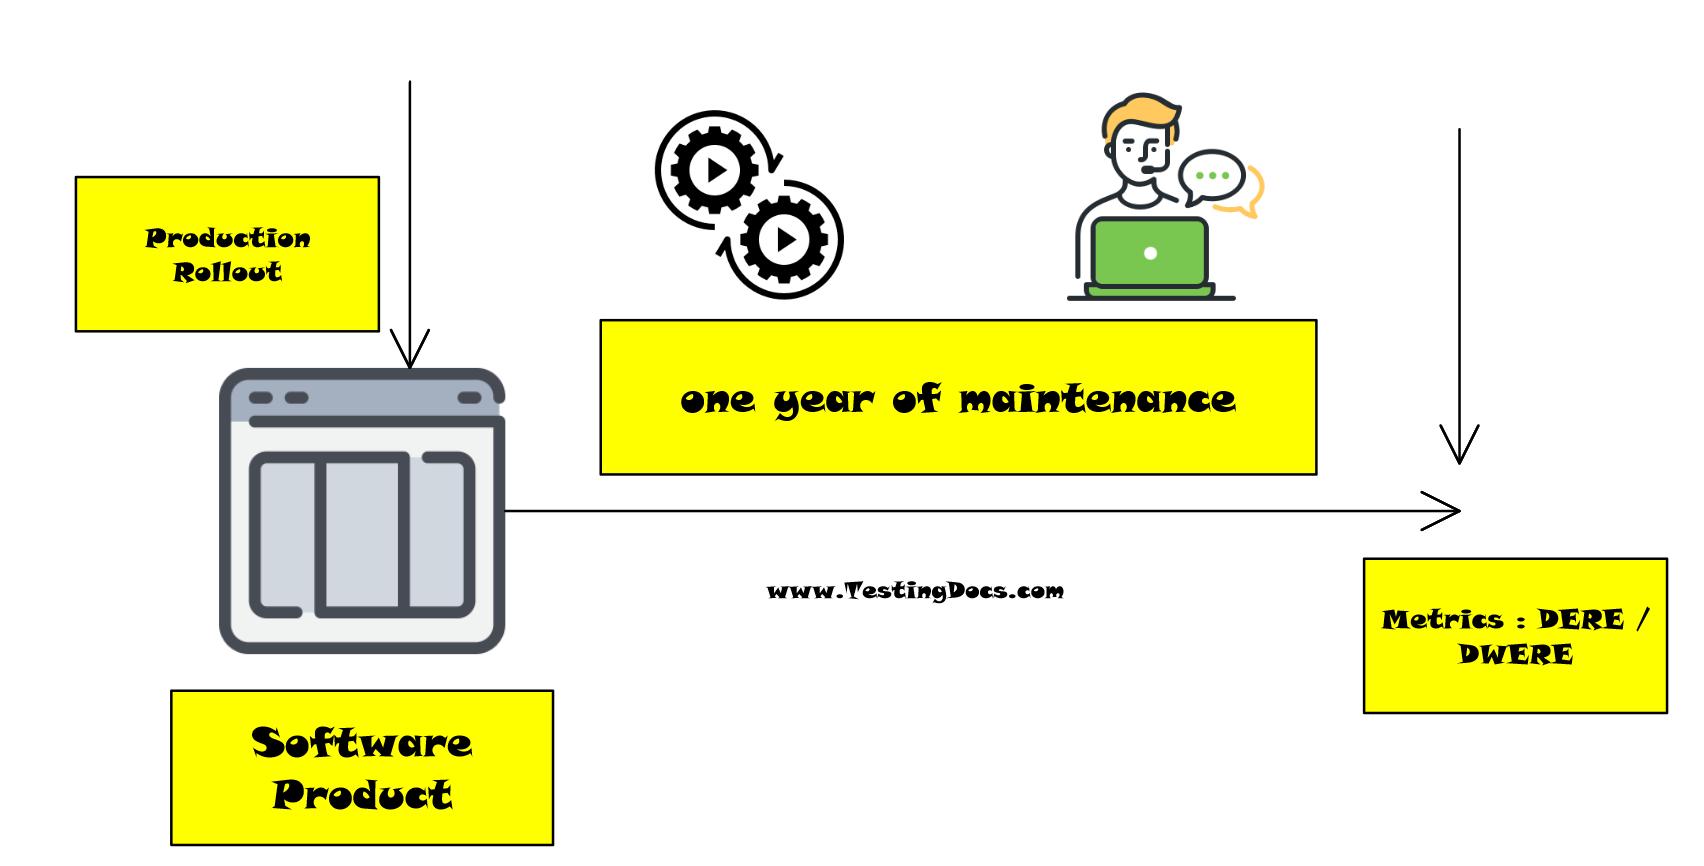 DERE DWERE Software Metrics